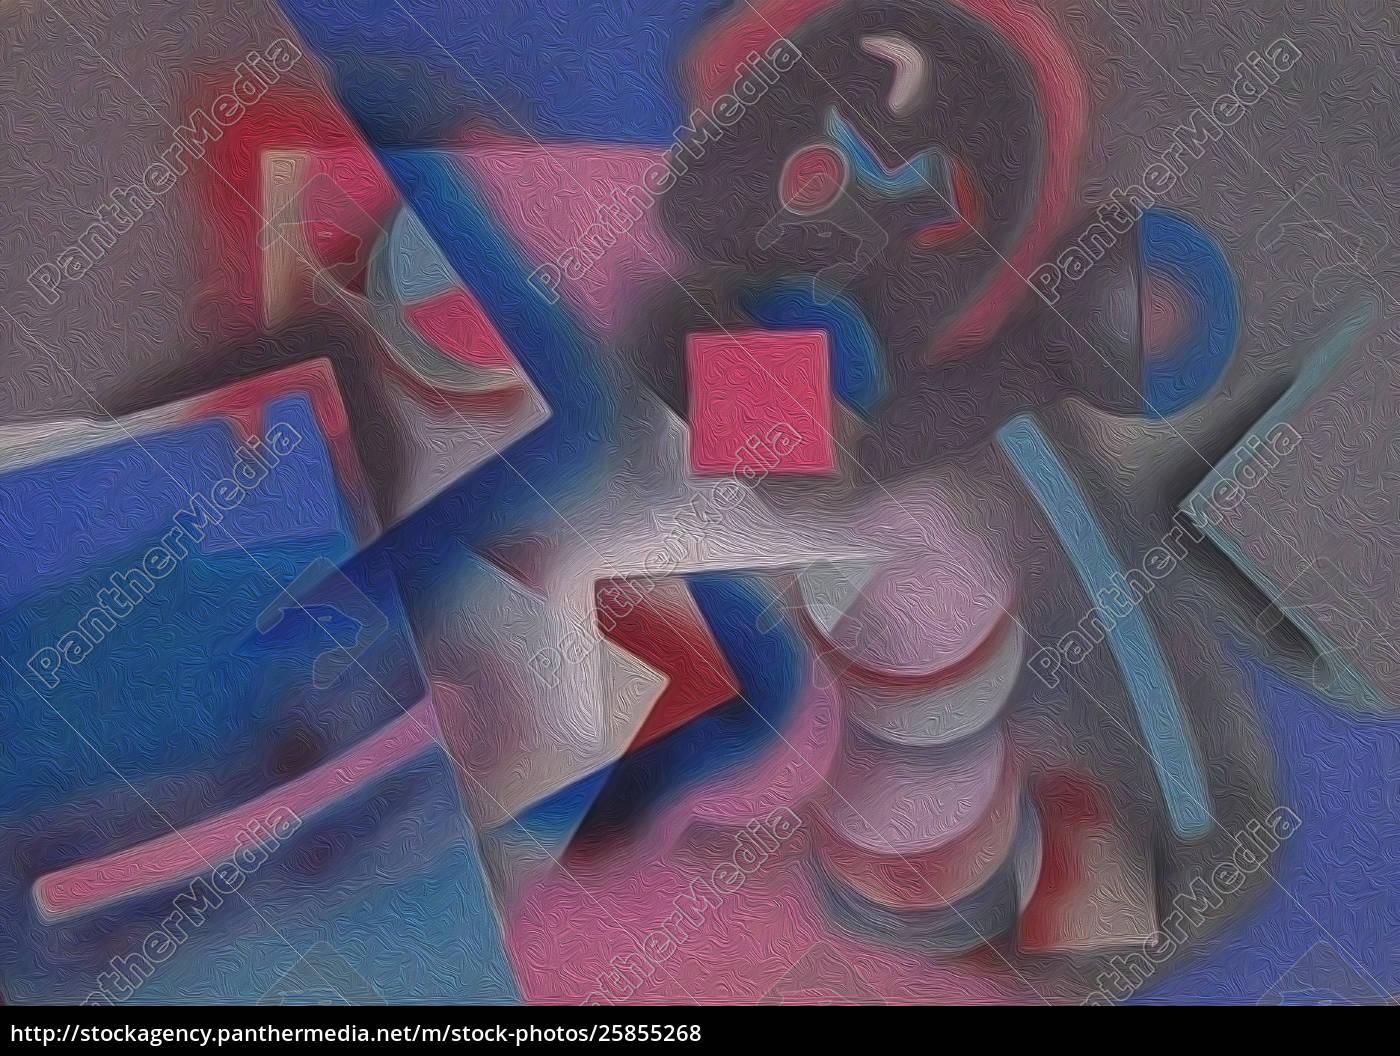 Abstrakte Malerei Mit Geometrischen Figuren Lizenzfreies Foto 25855268 Bildagentur Panthermedia